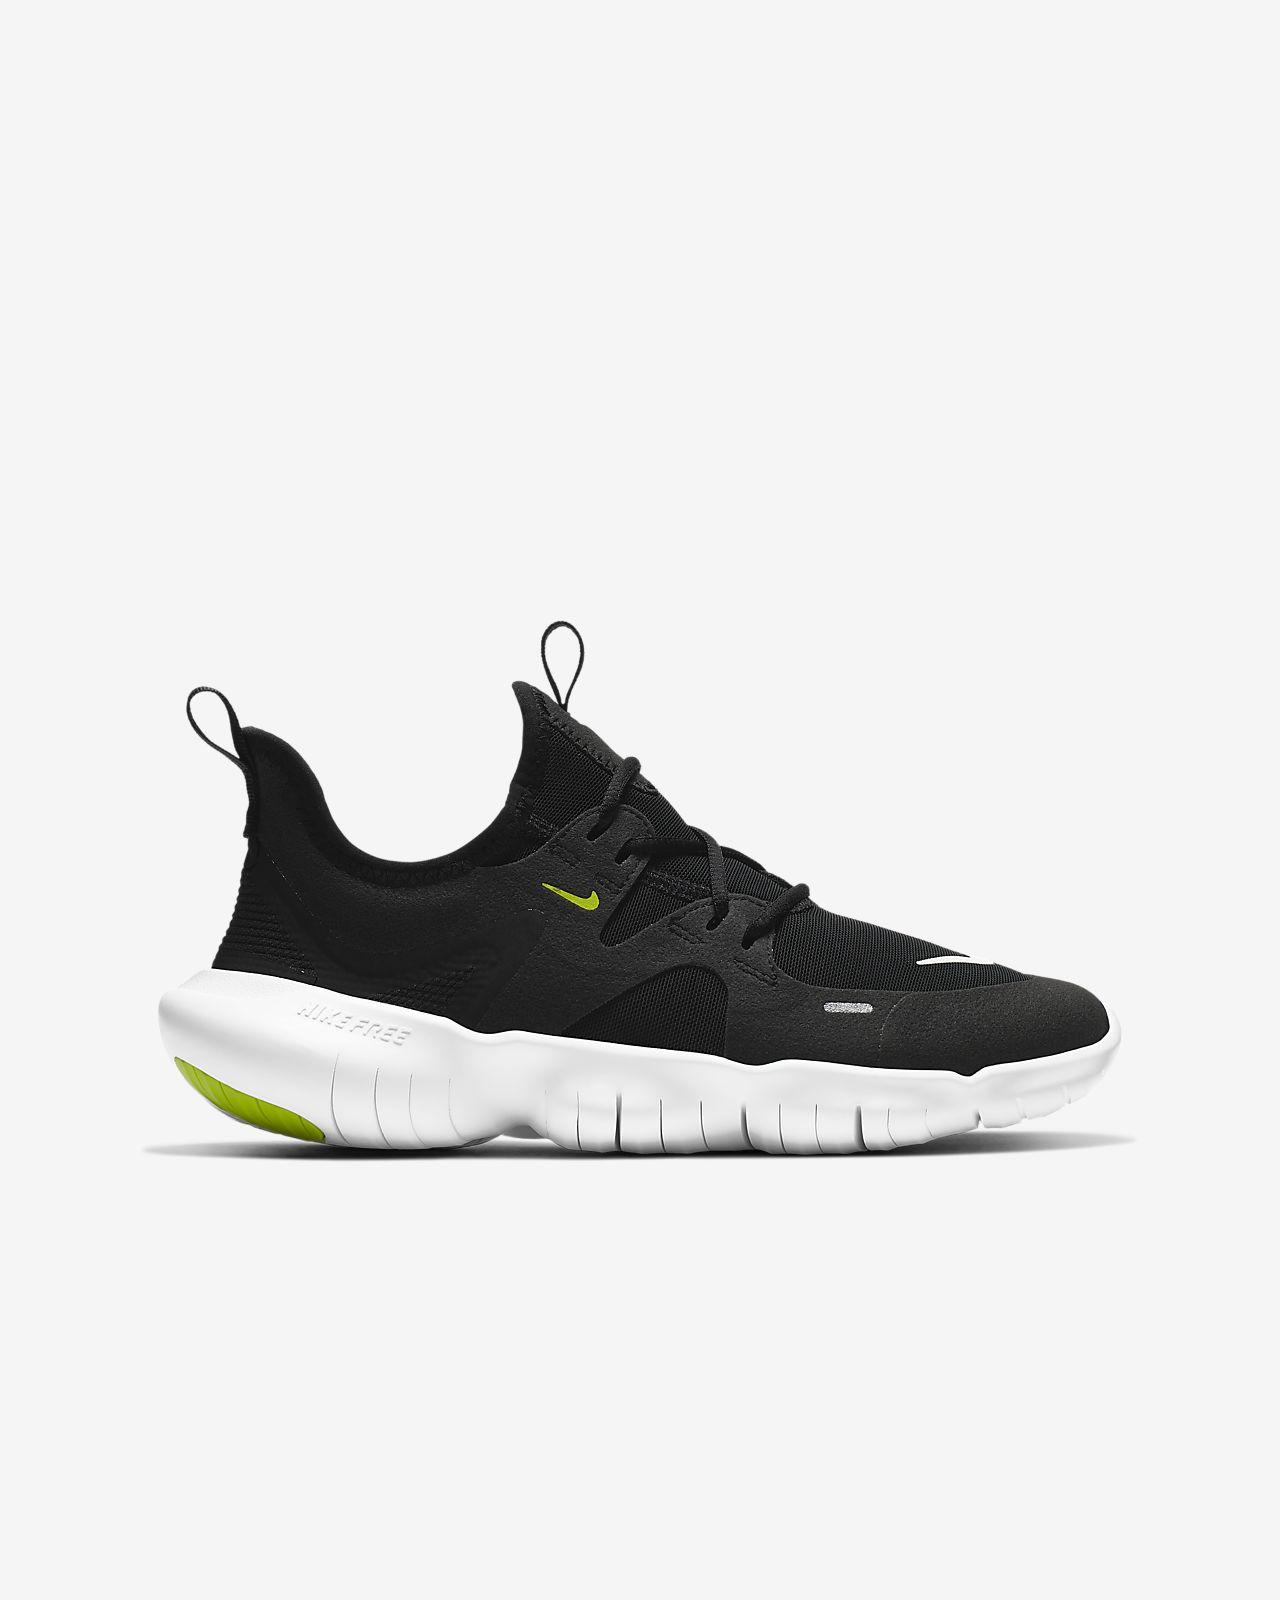 new product 5cd1c d05d5 ... Nike Free RN 5.0 Older Kids  Running Shoe